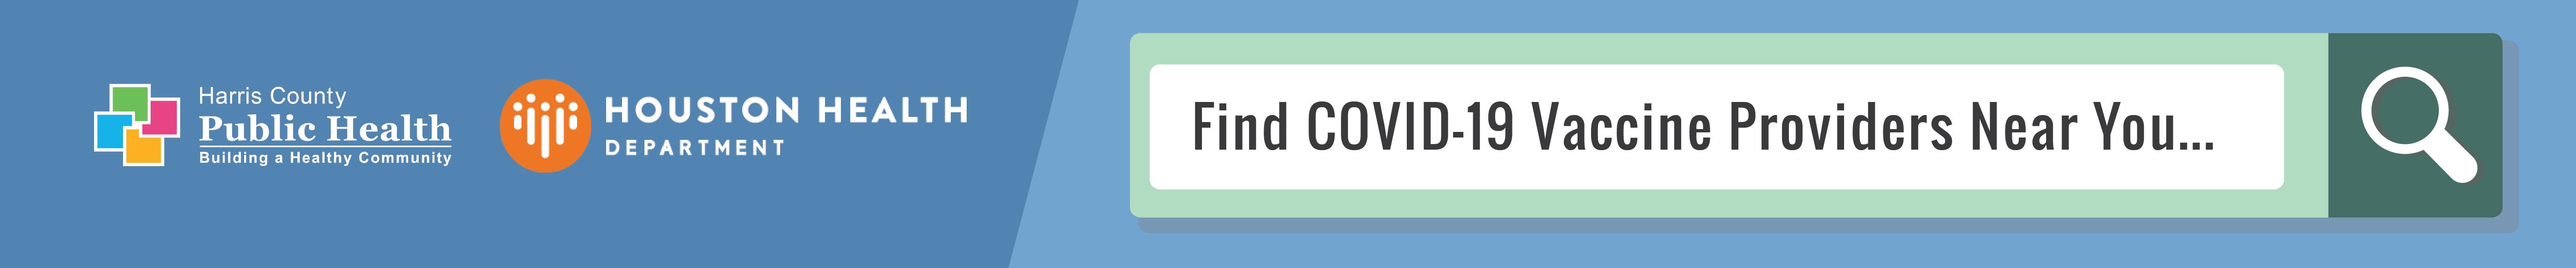 Click here to find COVID-19 vaccine providers near you.